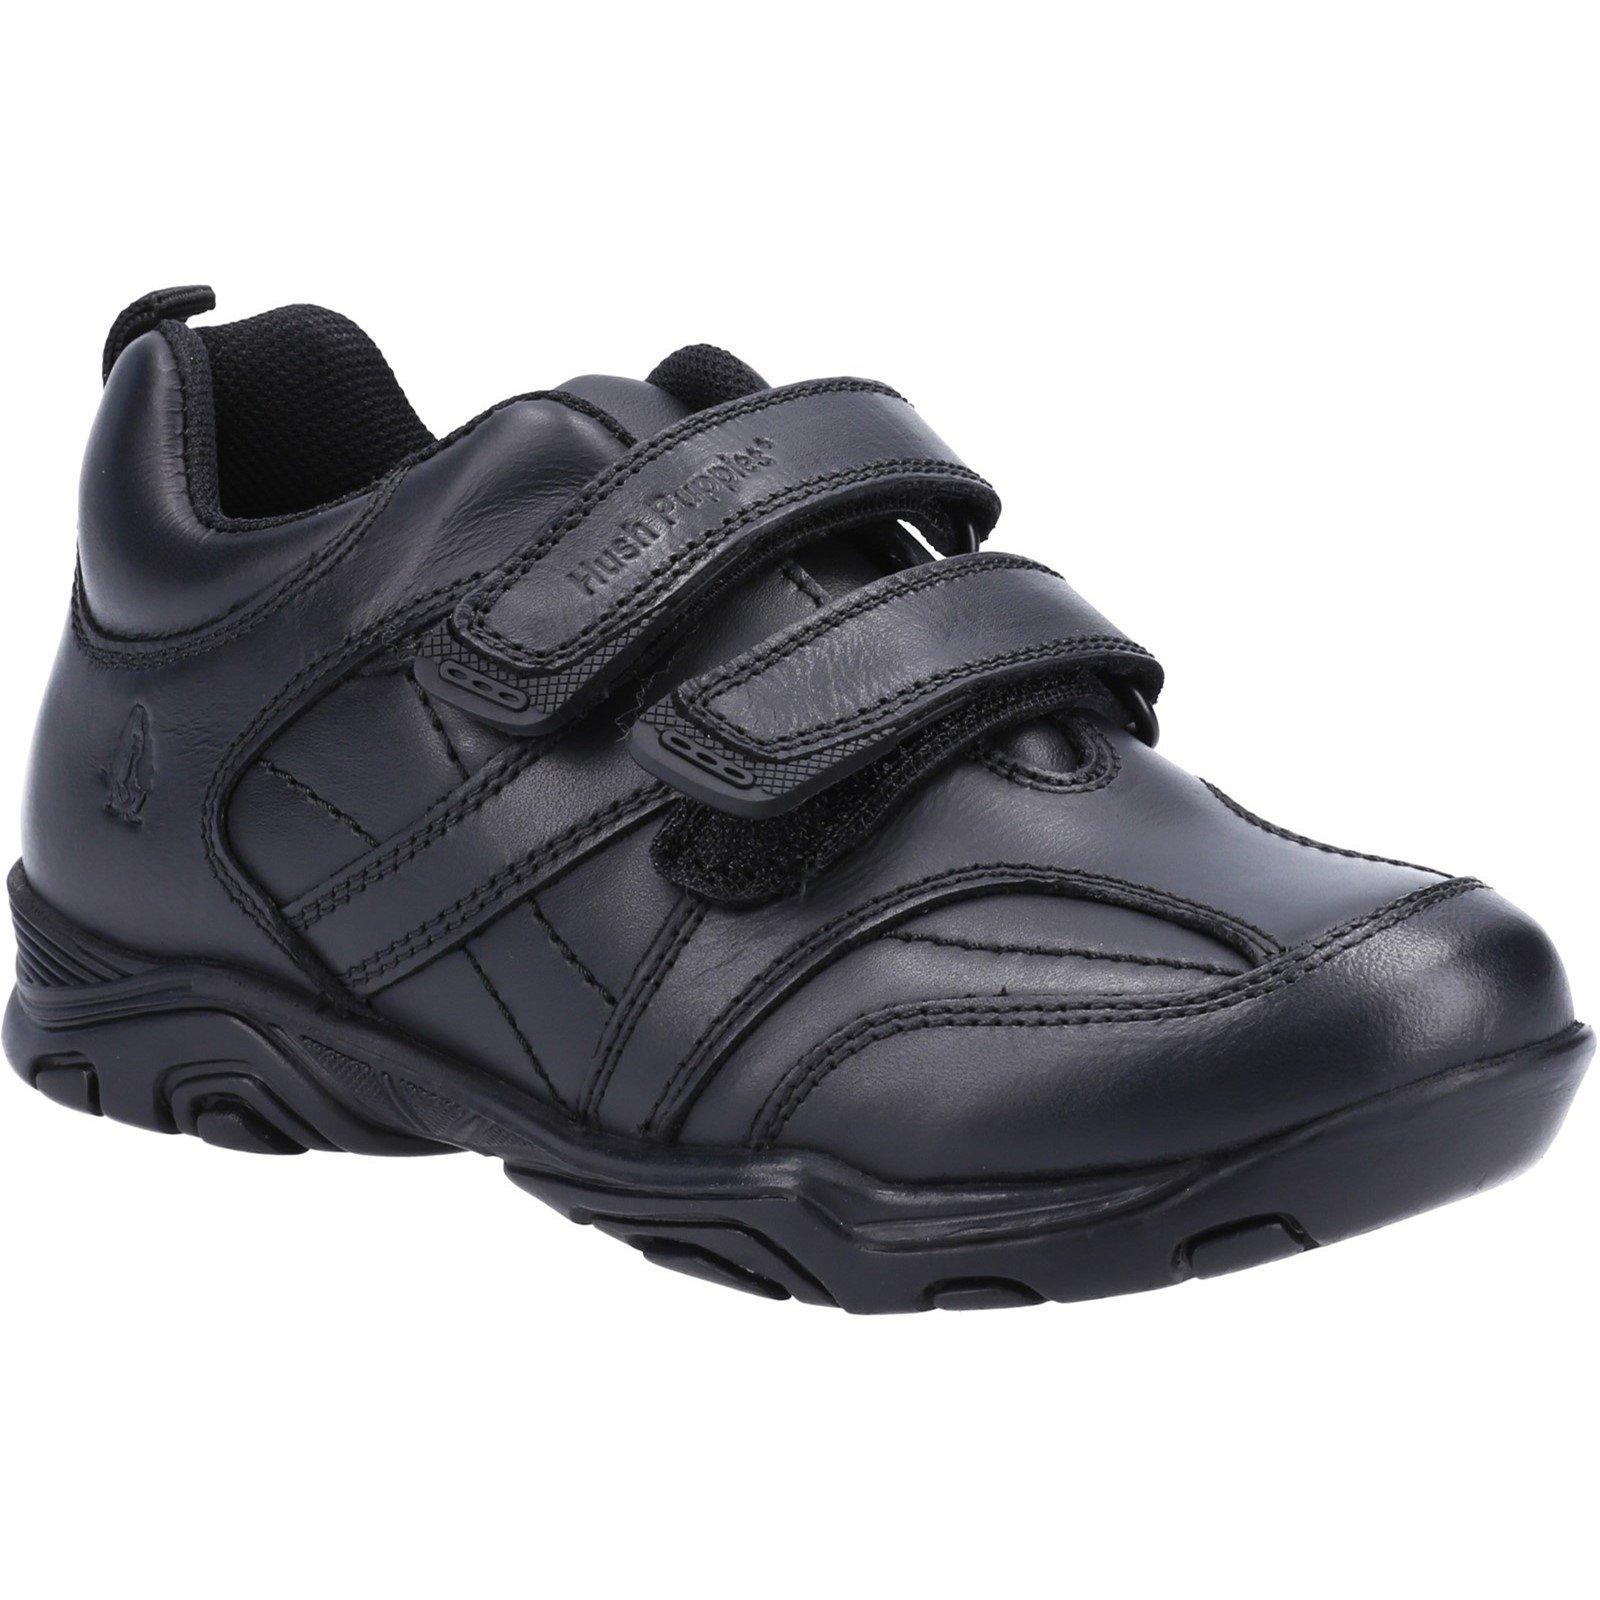 Hush Puppies Kid's Levi Infant School Shoe Black 32629 - Black 8